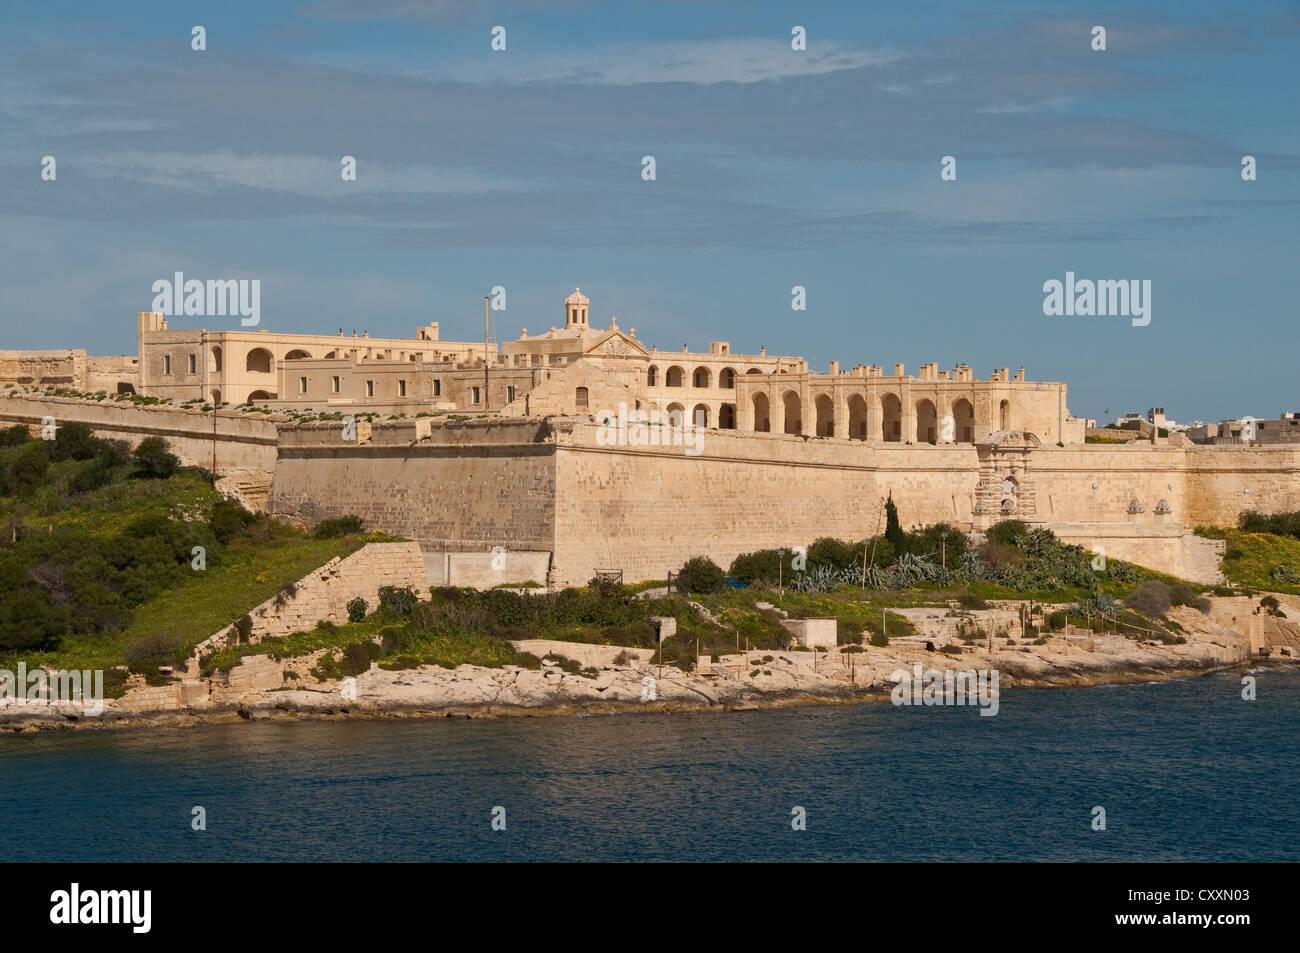 Fort Manuel Stock Photos & Fort Manuel Stock Images - Alamy